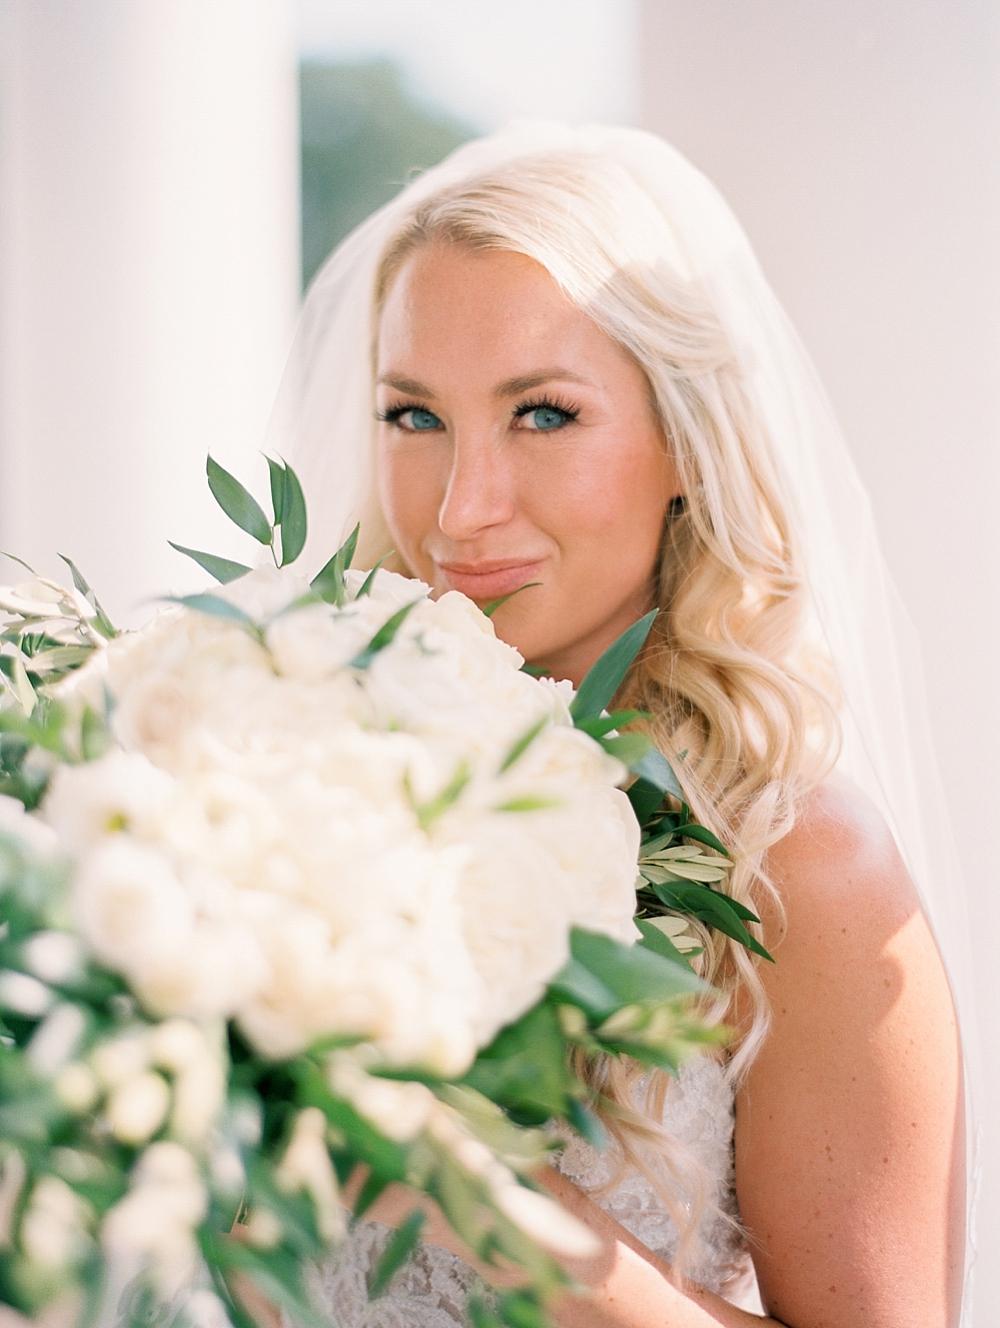 kristin-la-voie-photography-lehmann-mansion-wedding-photographer-90